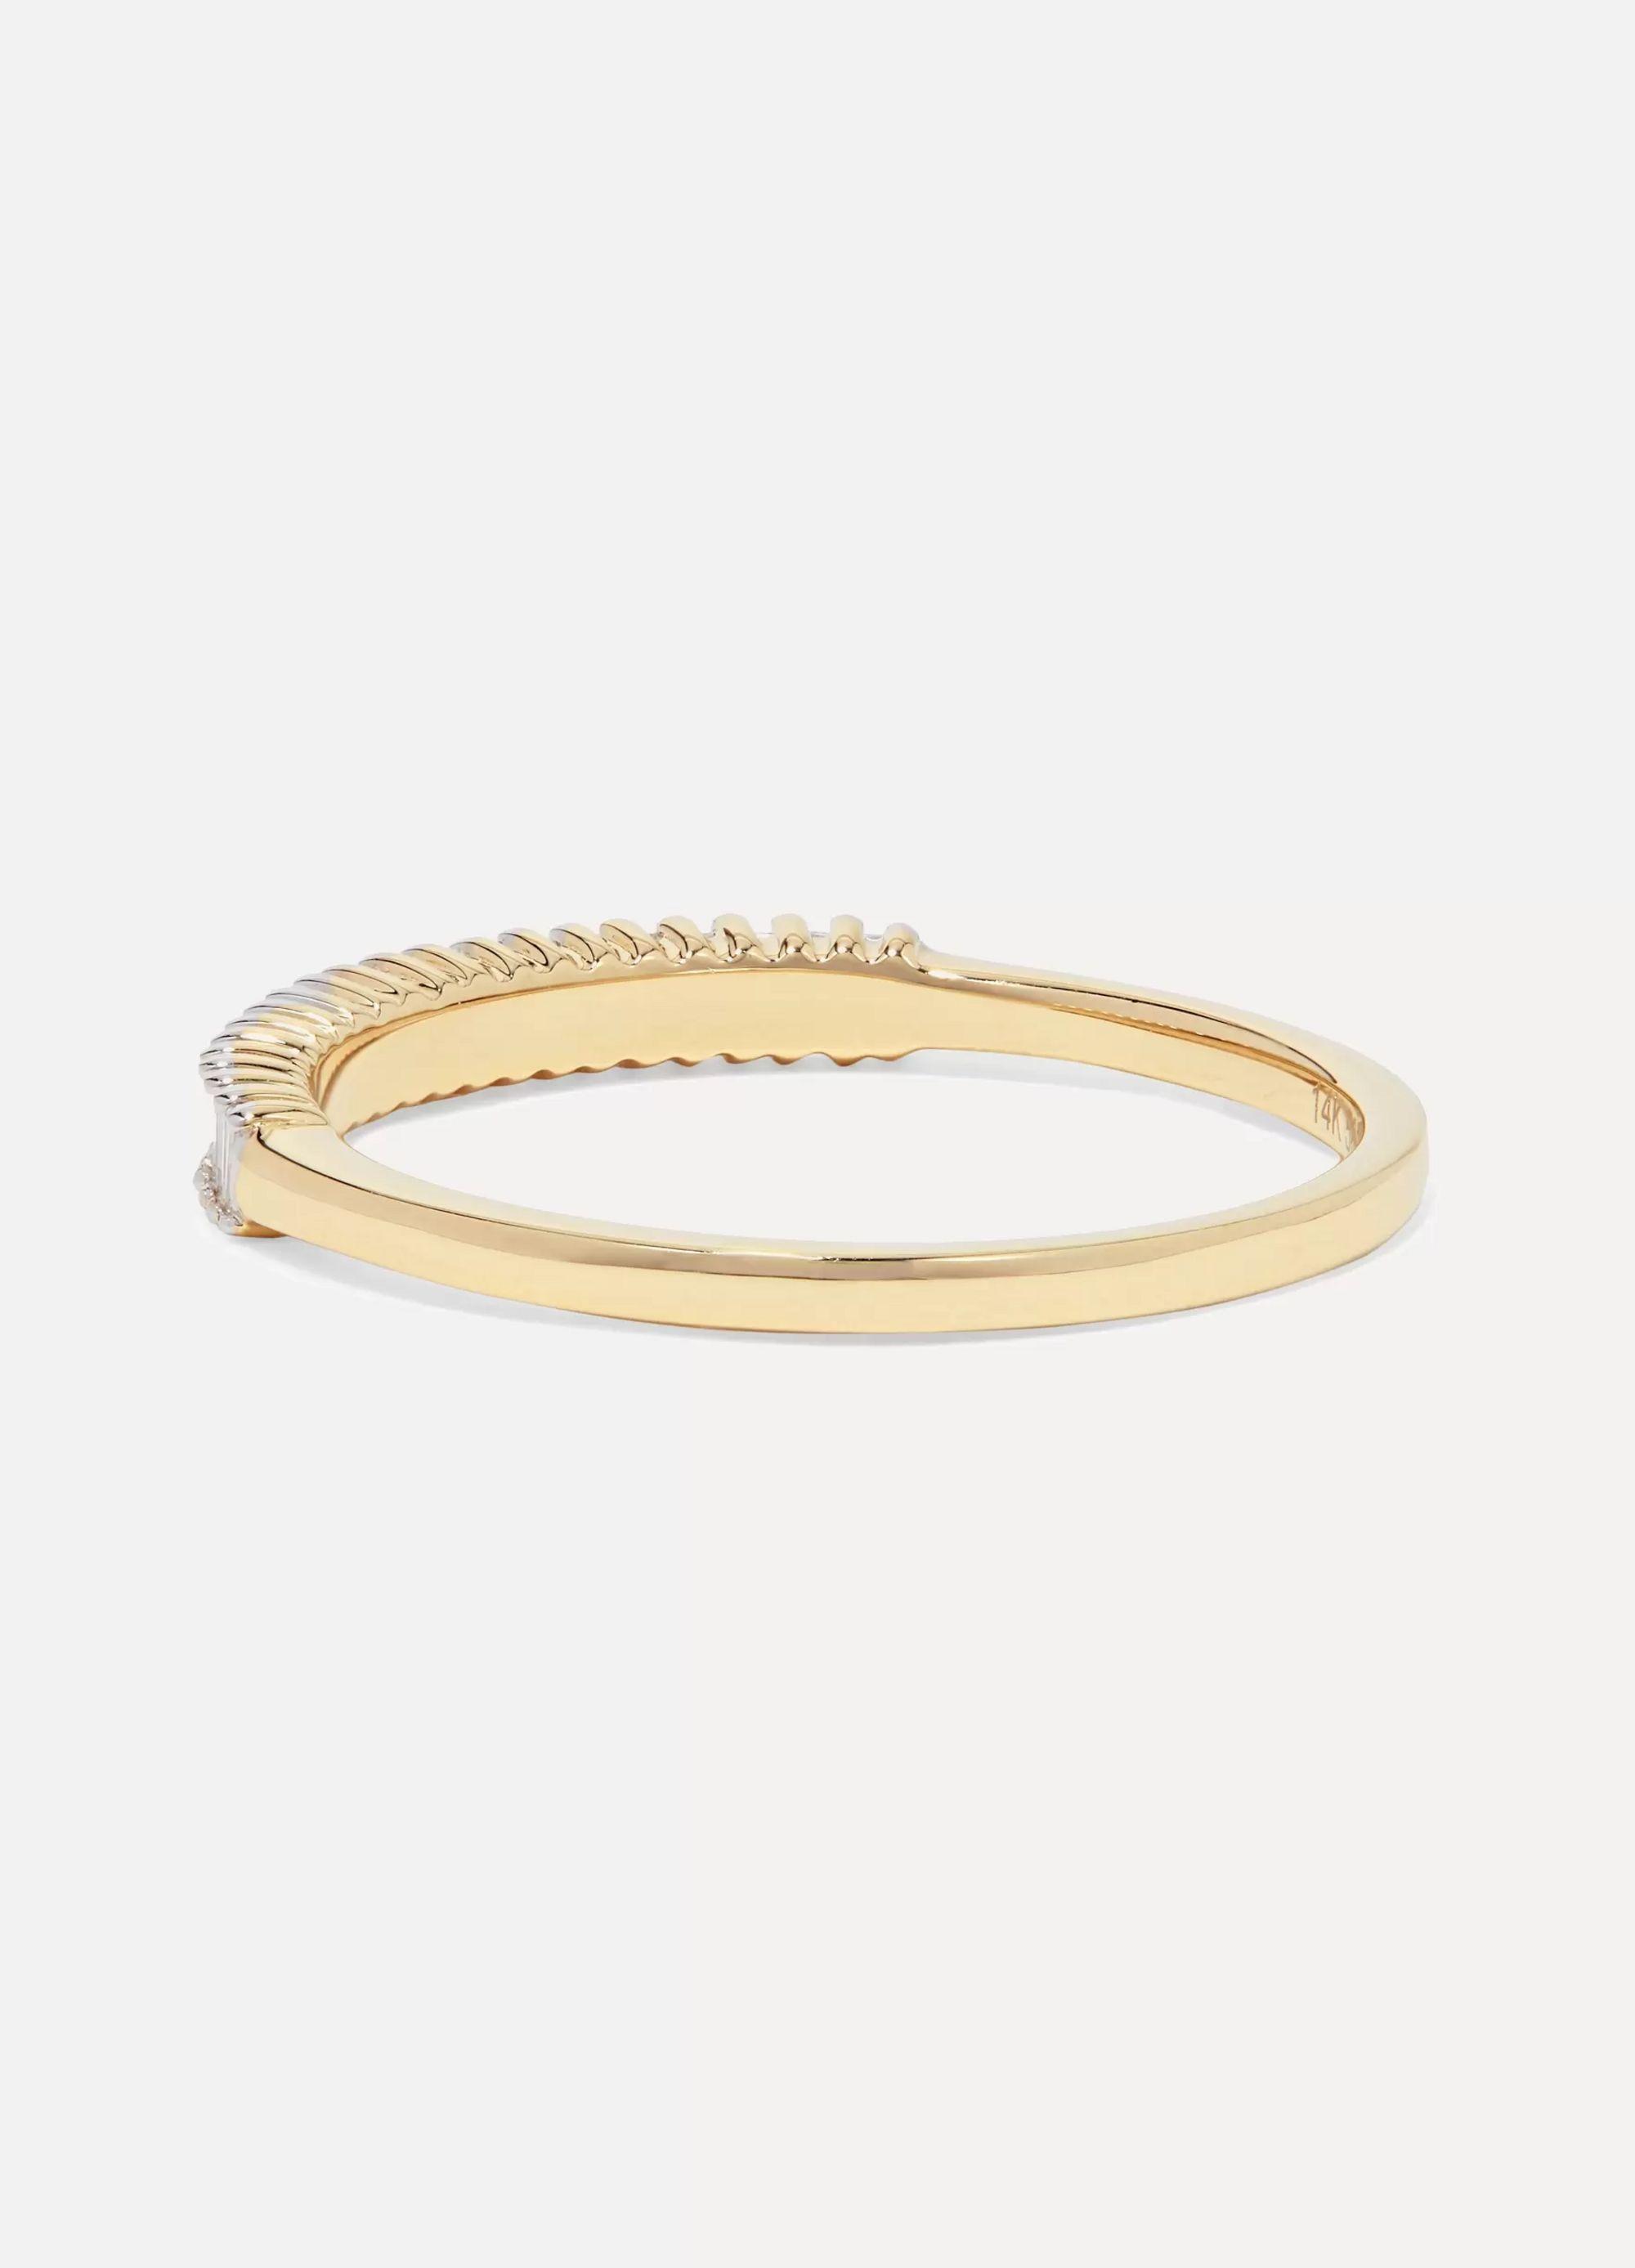 STONE AND STRAND 14-karat gold diamond ring